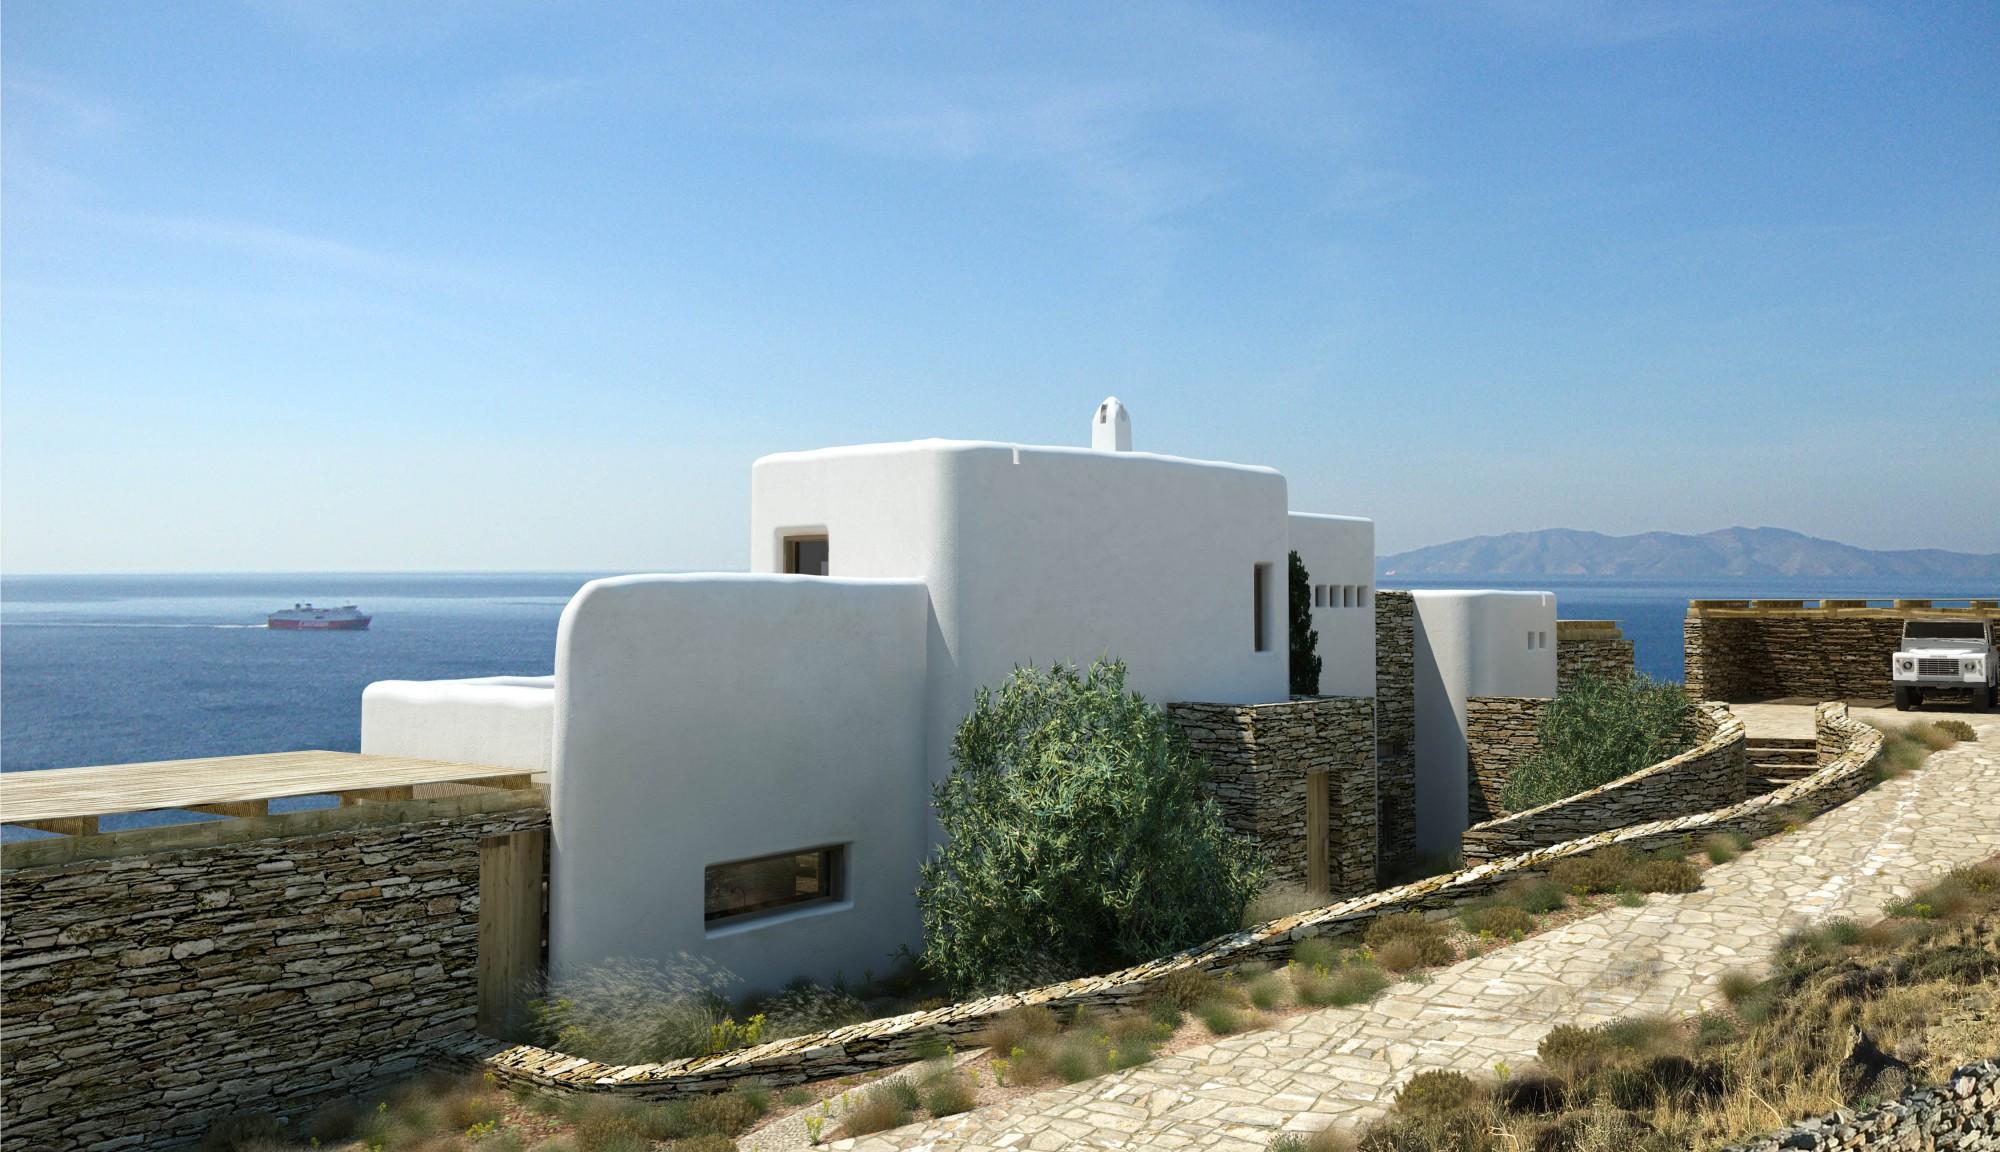 Maison en vente en Grèce, ile de Tinos